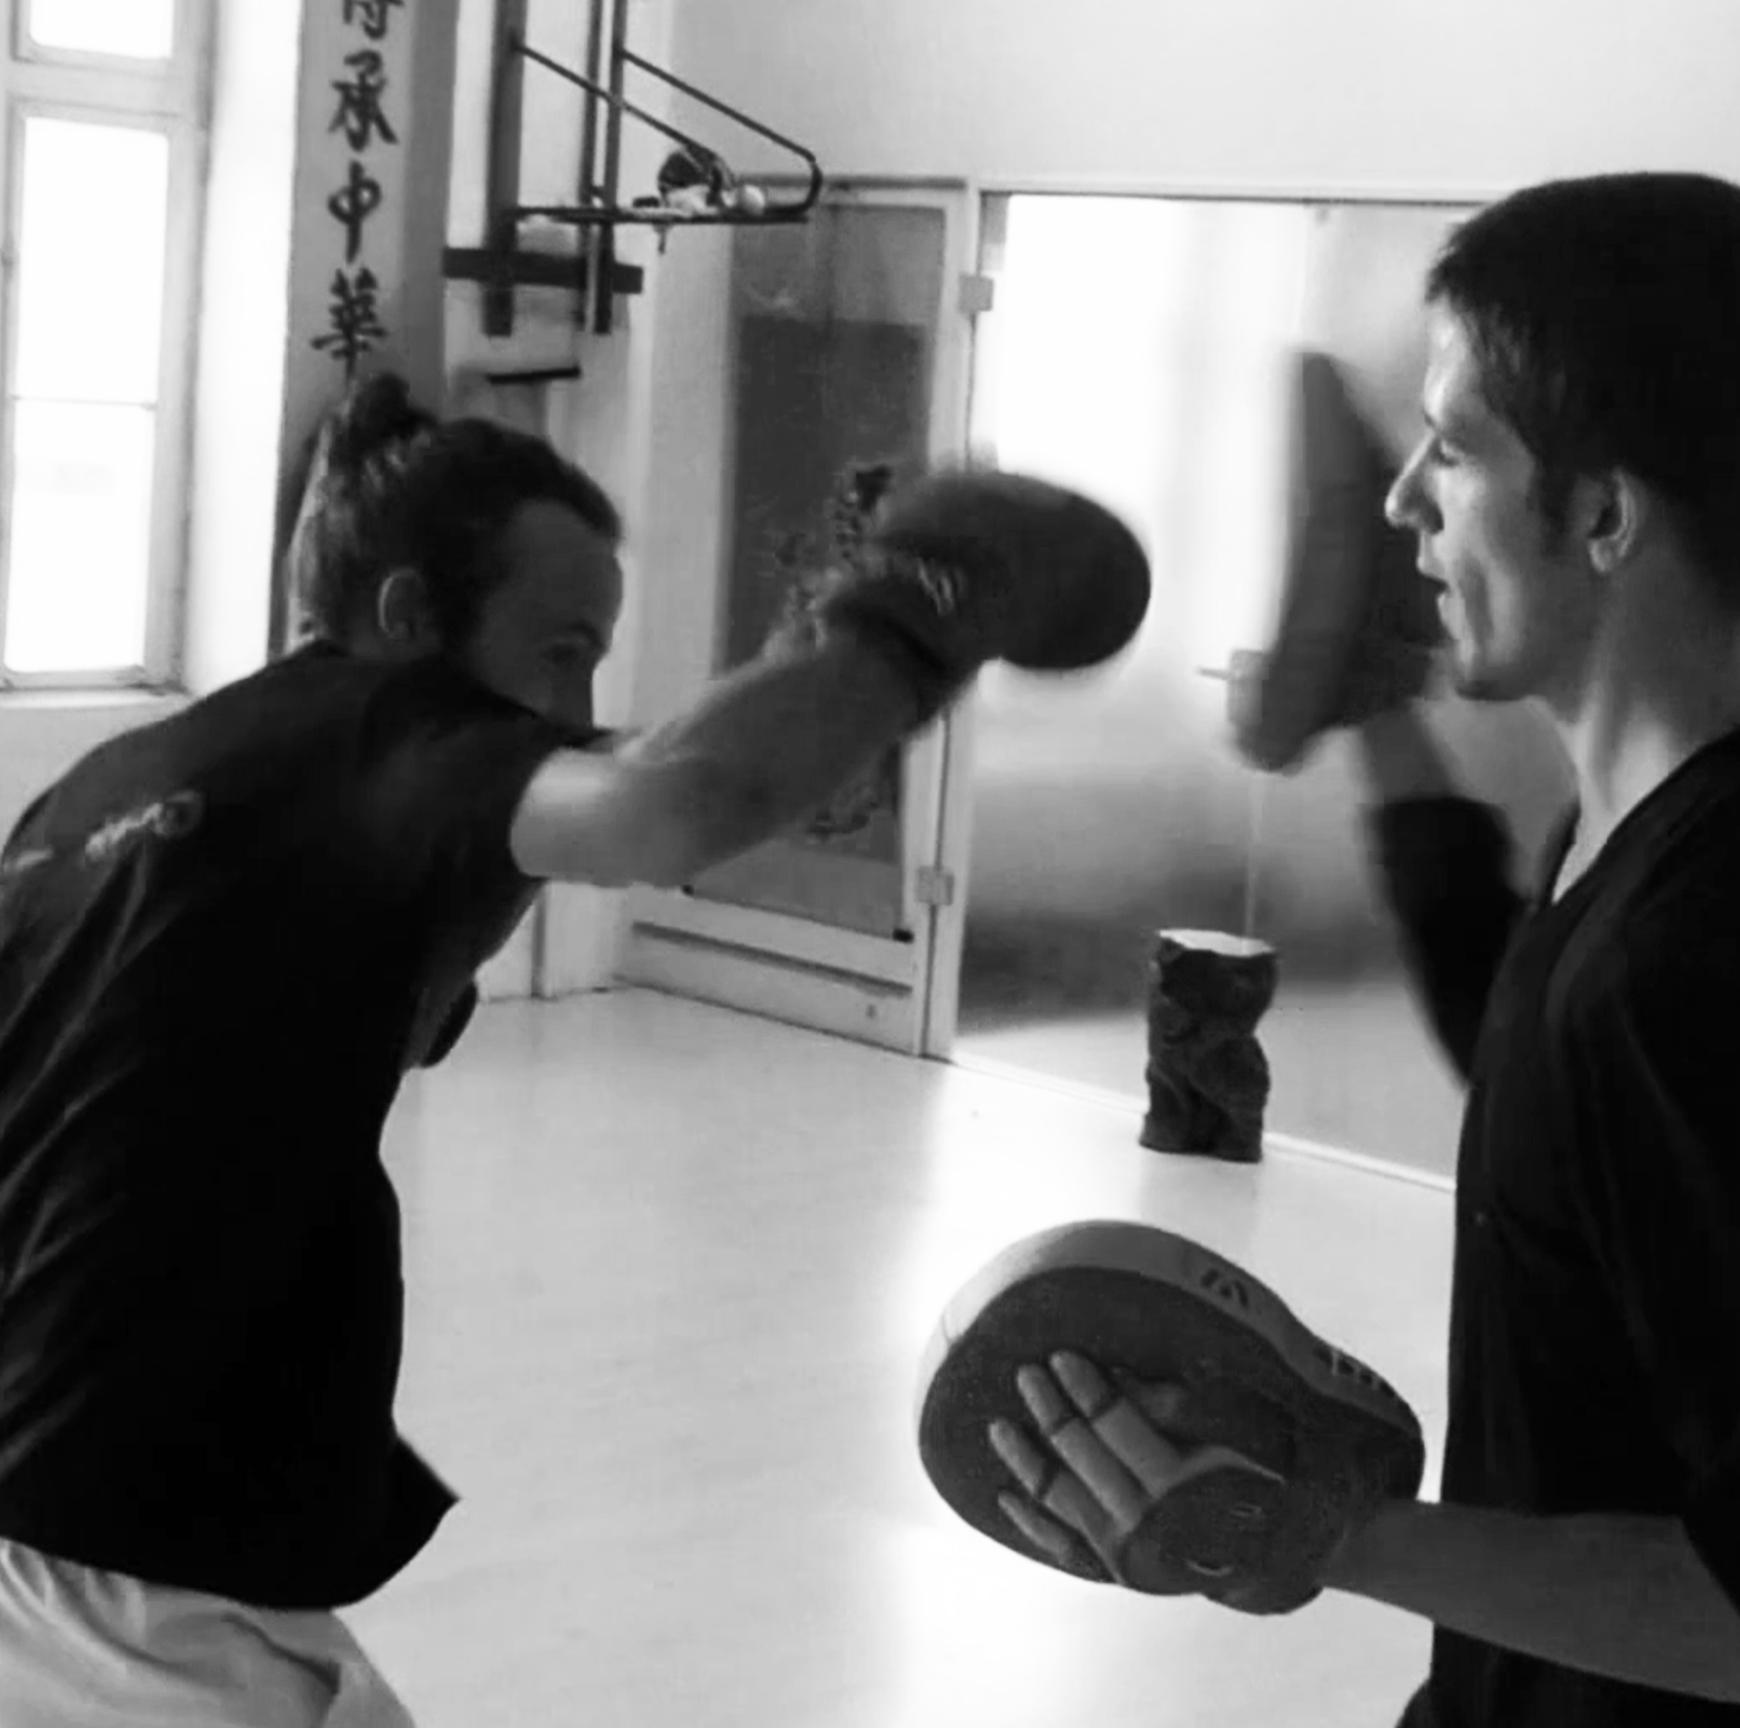 Boxing, Kick boxing